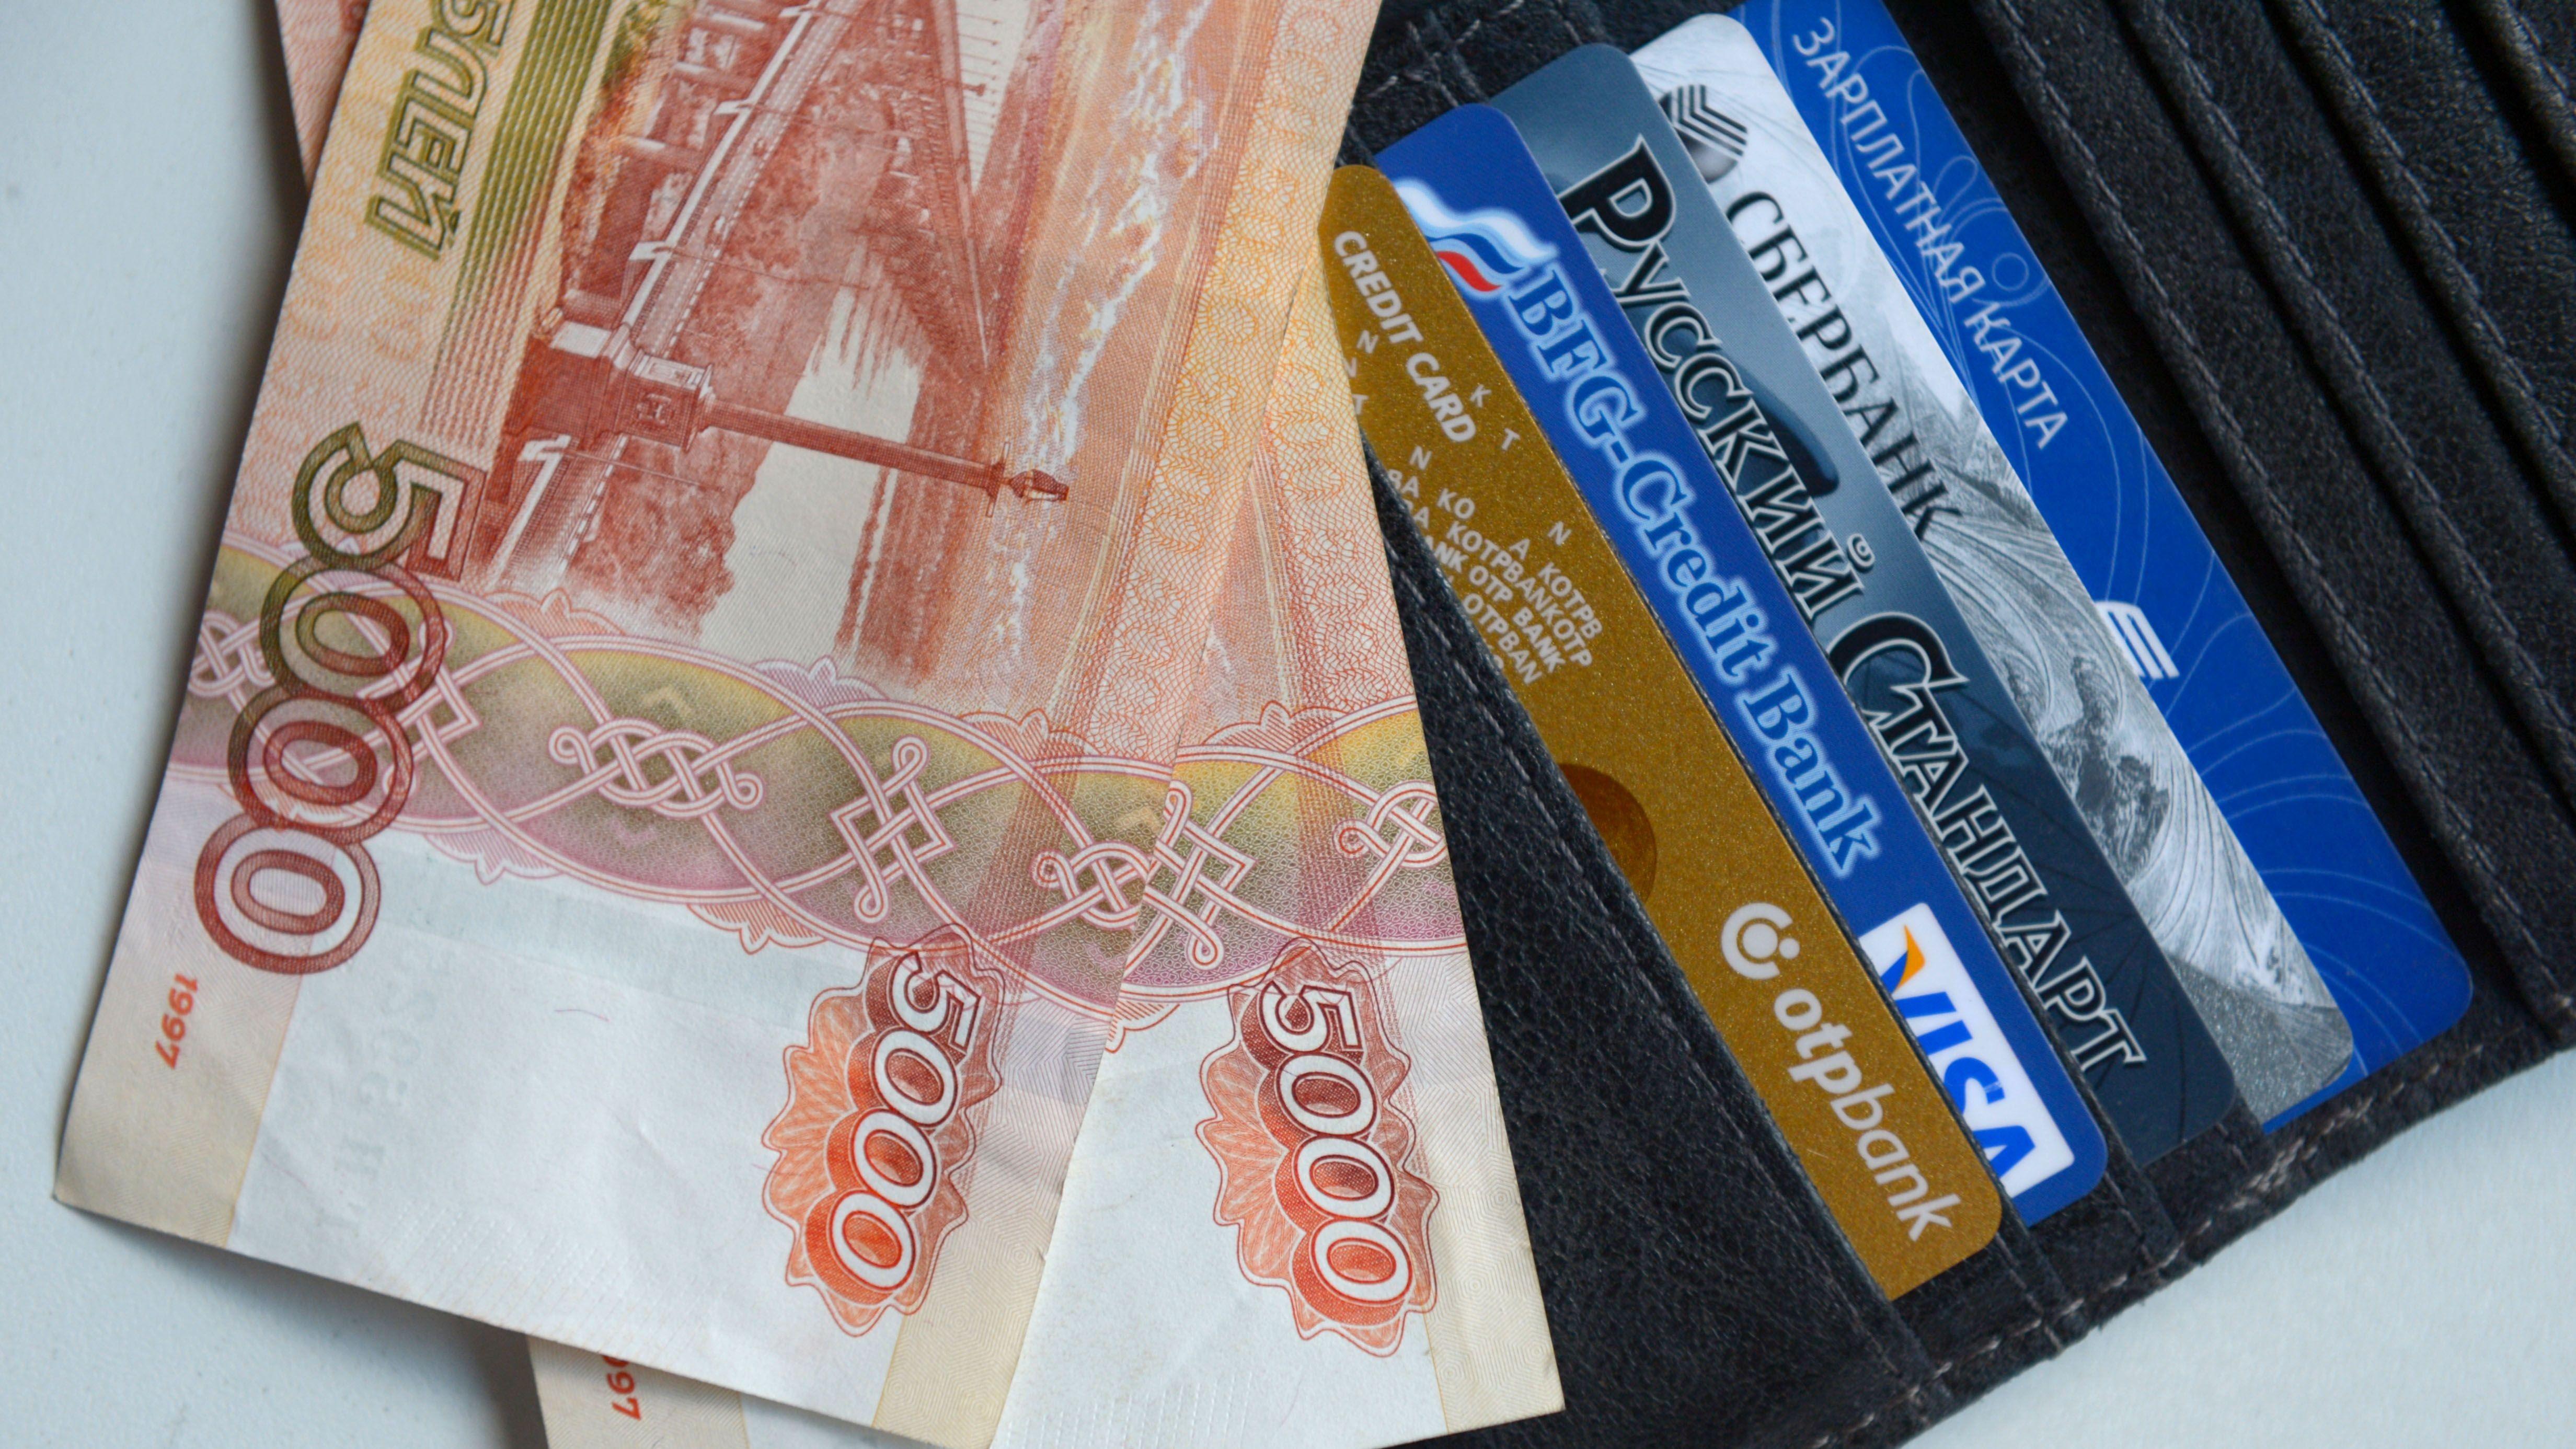 <p>Фото: &copy;&nbsp;РИА Новости/Владимир Трефилов</p>